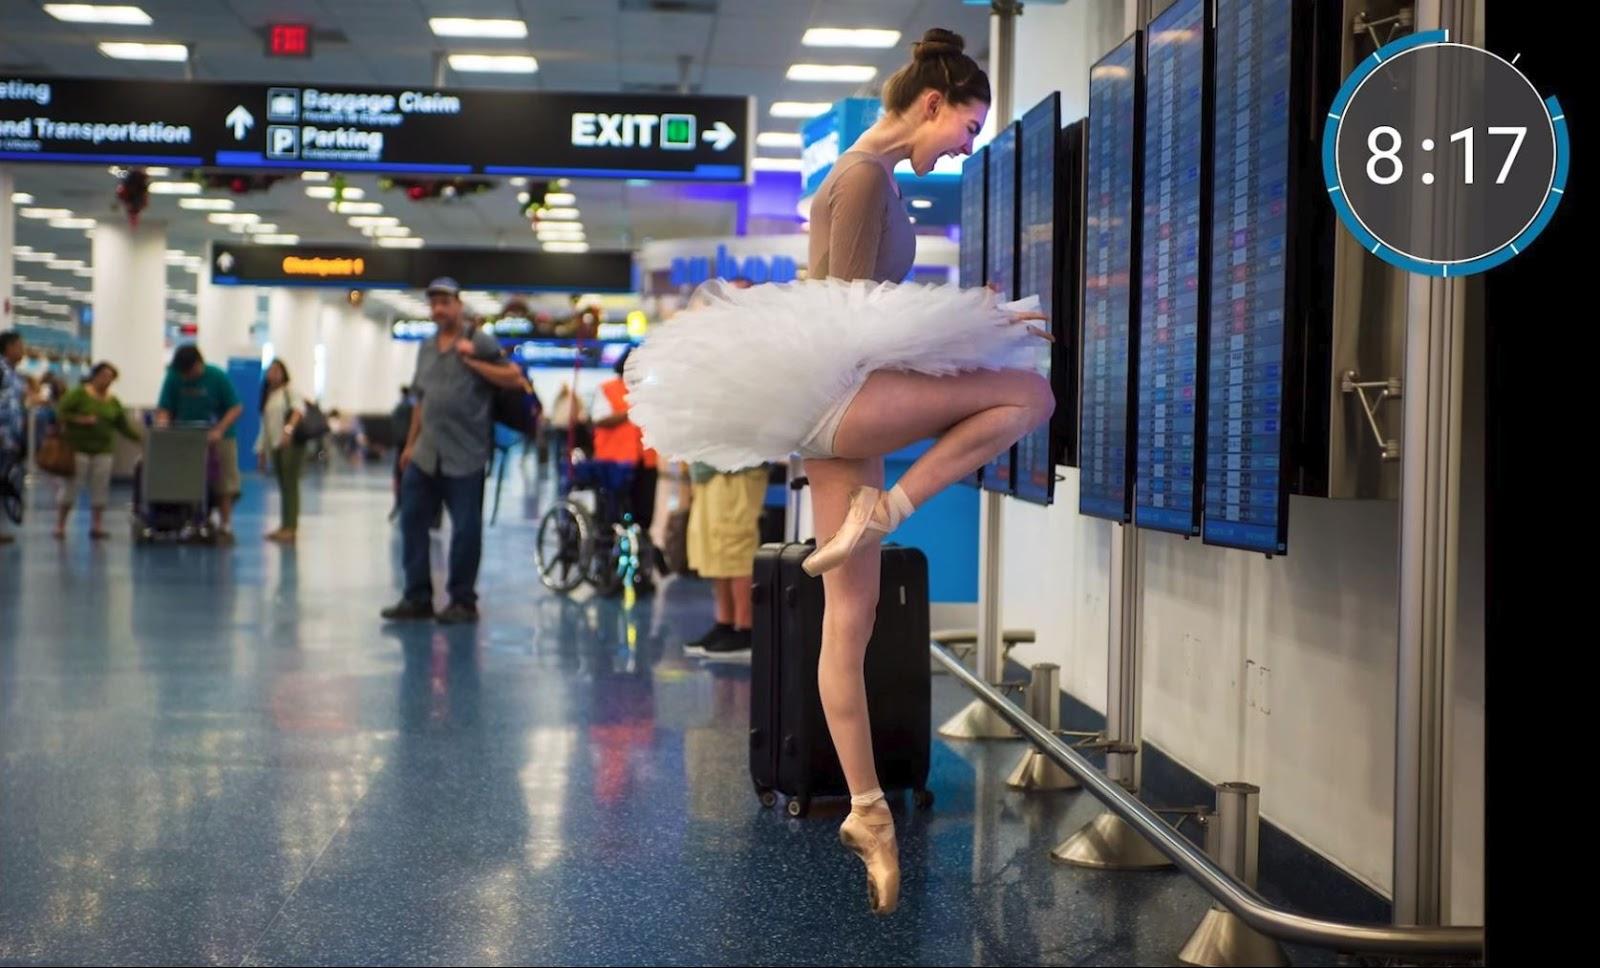 10 Minute Photo Challenge Crashes Miami International Airport by Jordan Matter